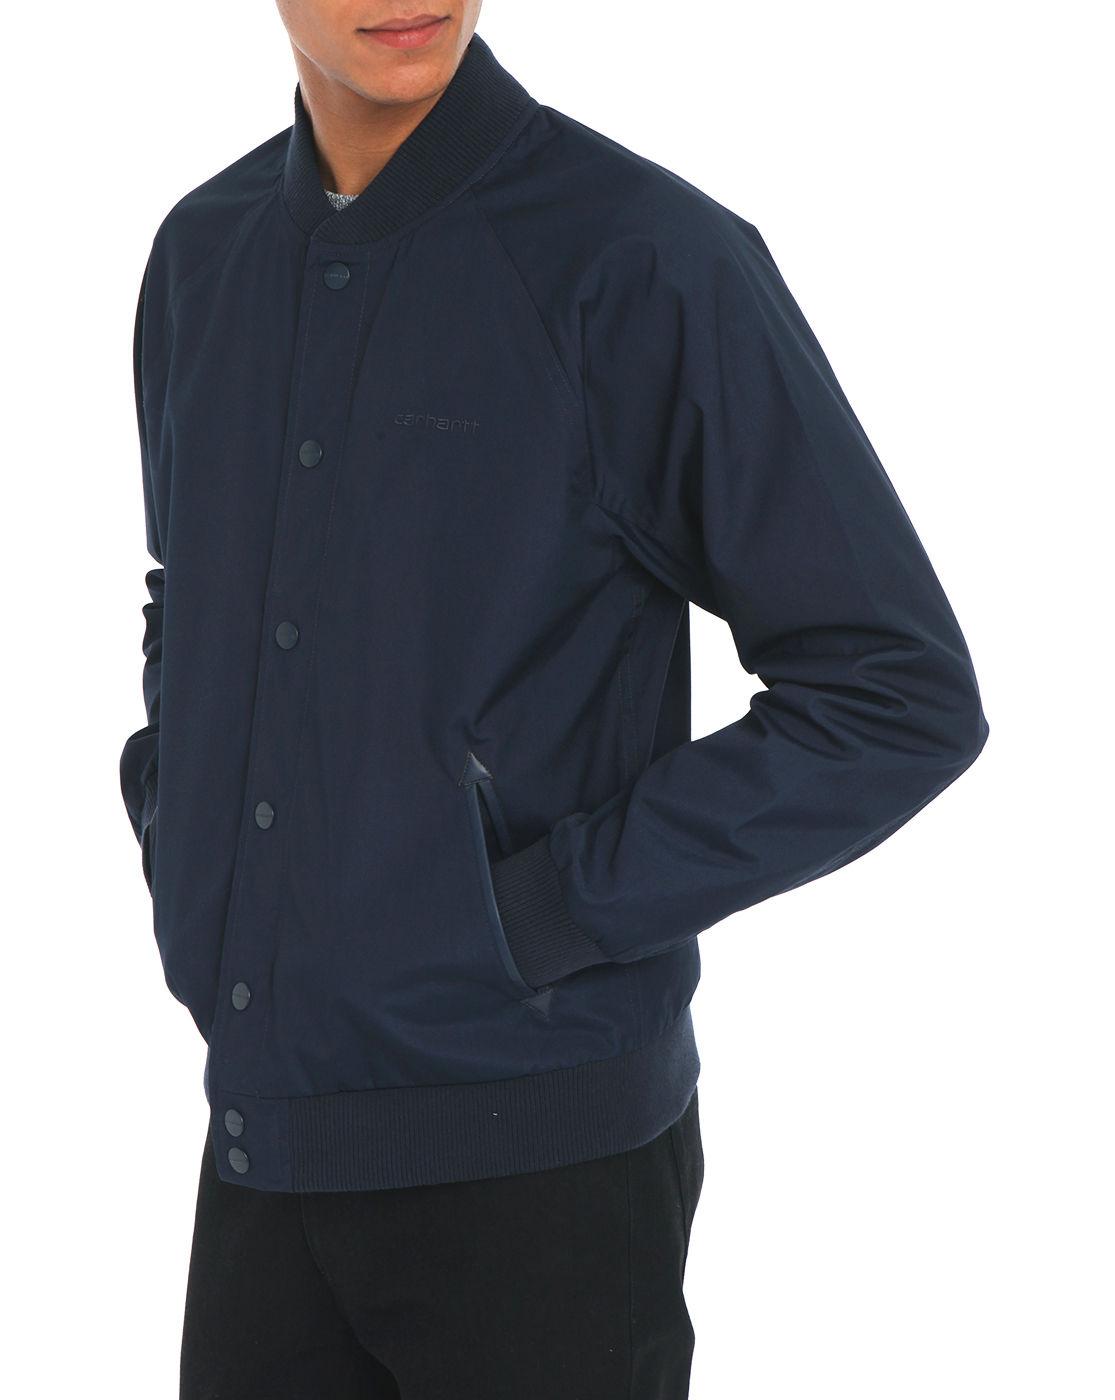 Carhartt Strike Navy Cotton Baseball Jacket In Blue For